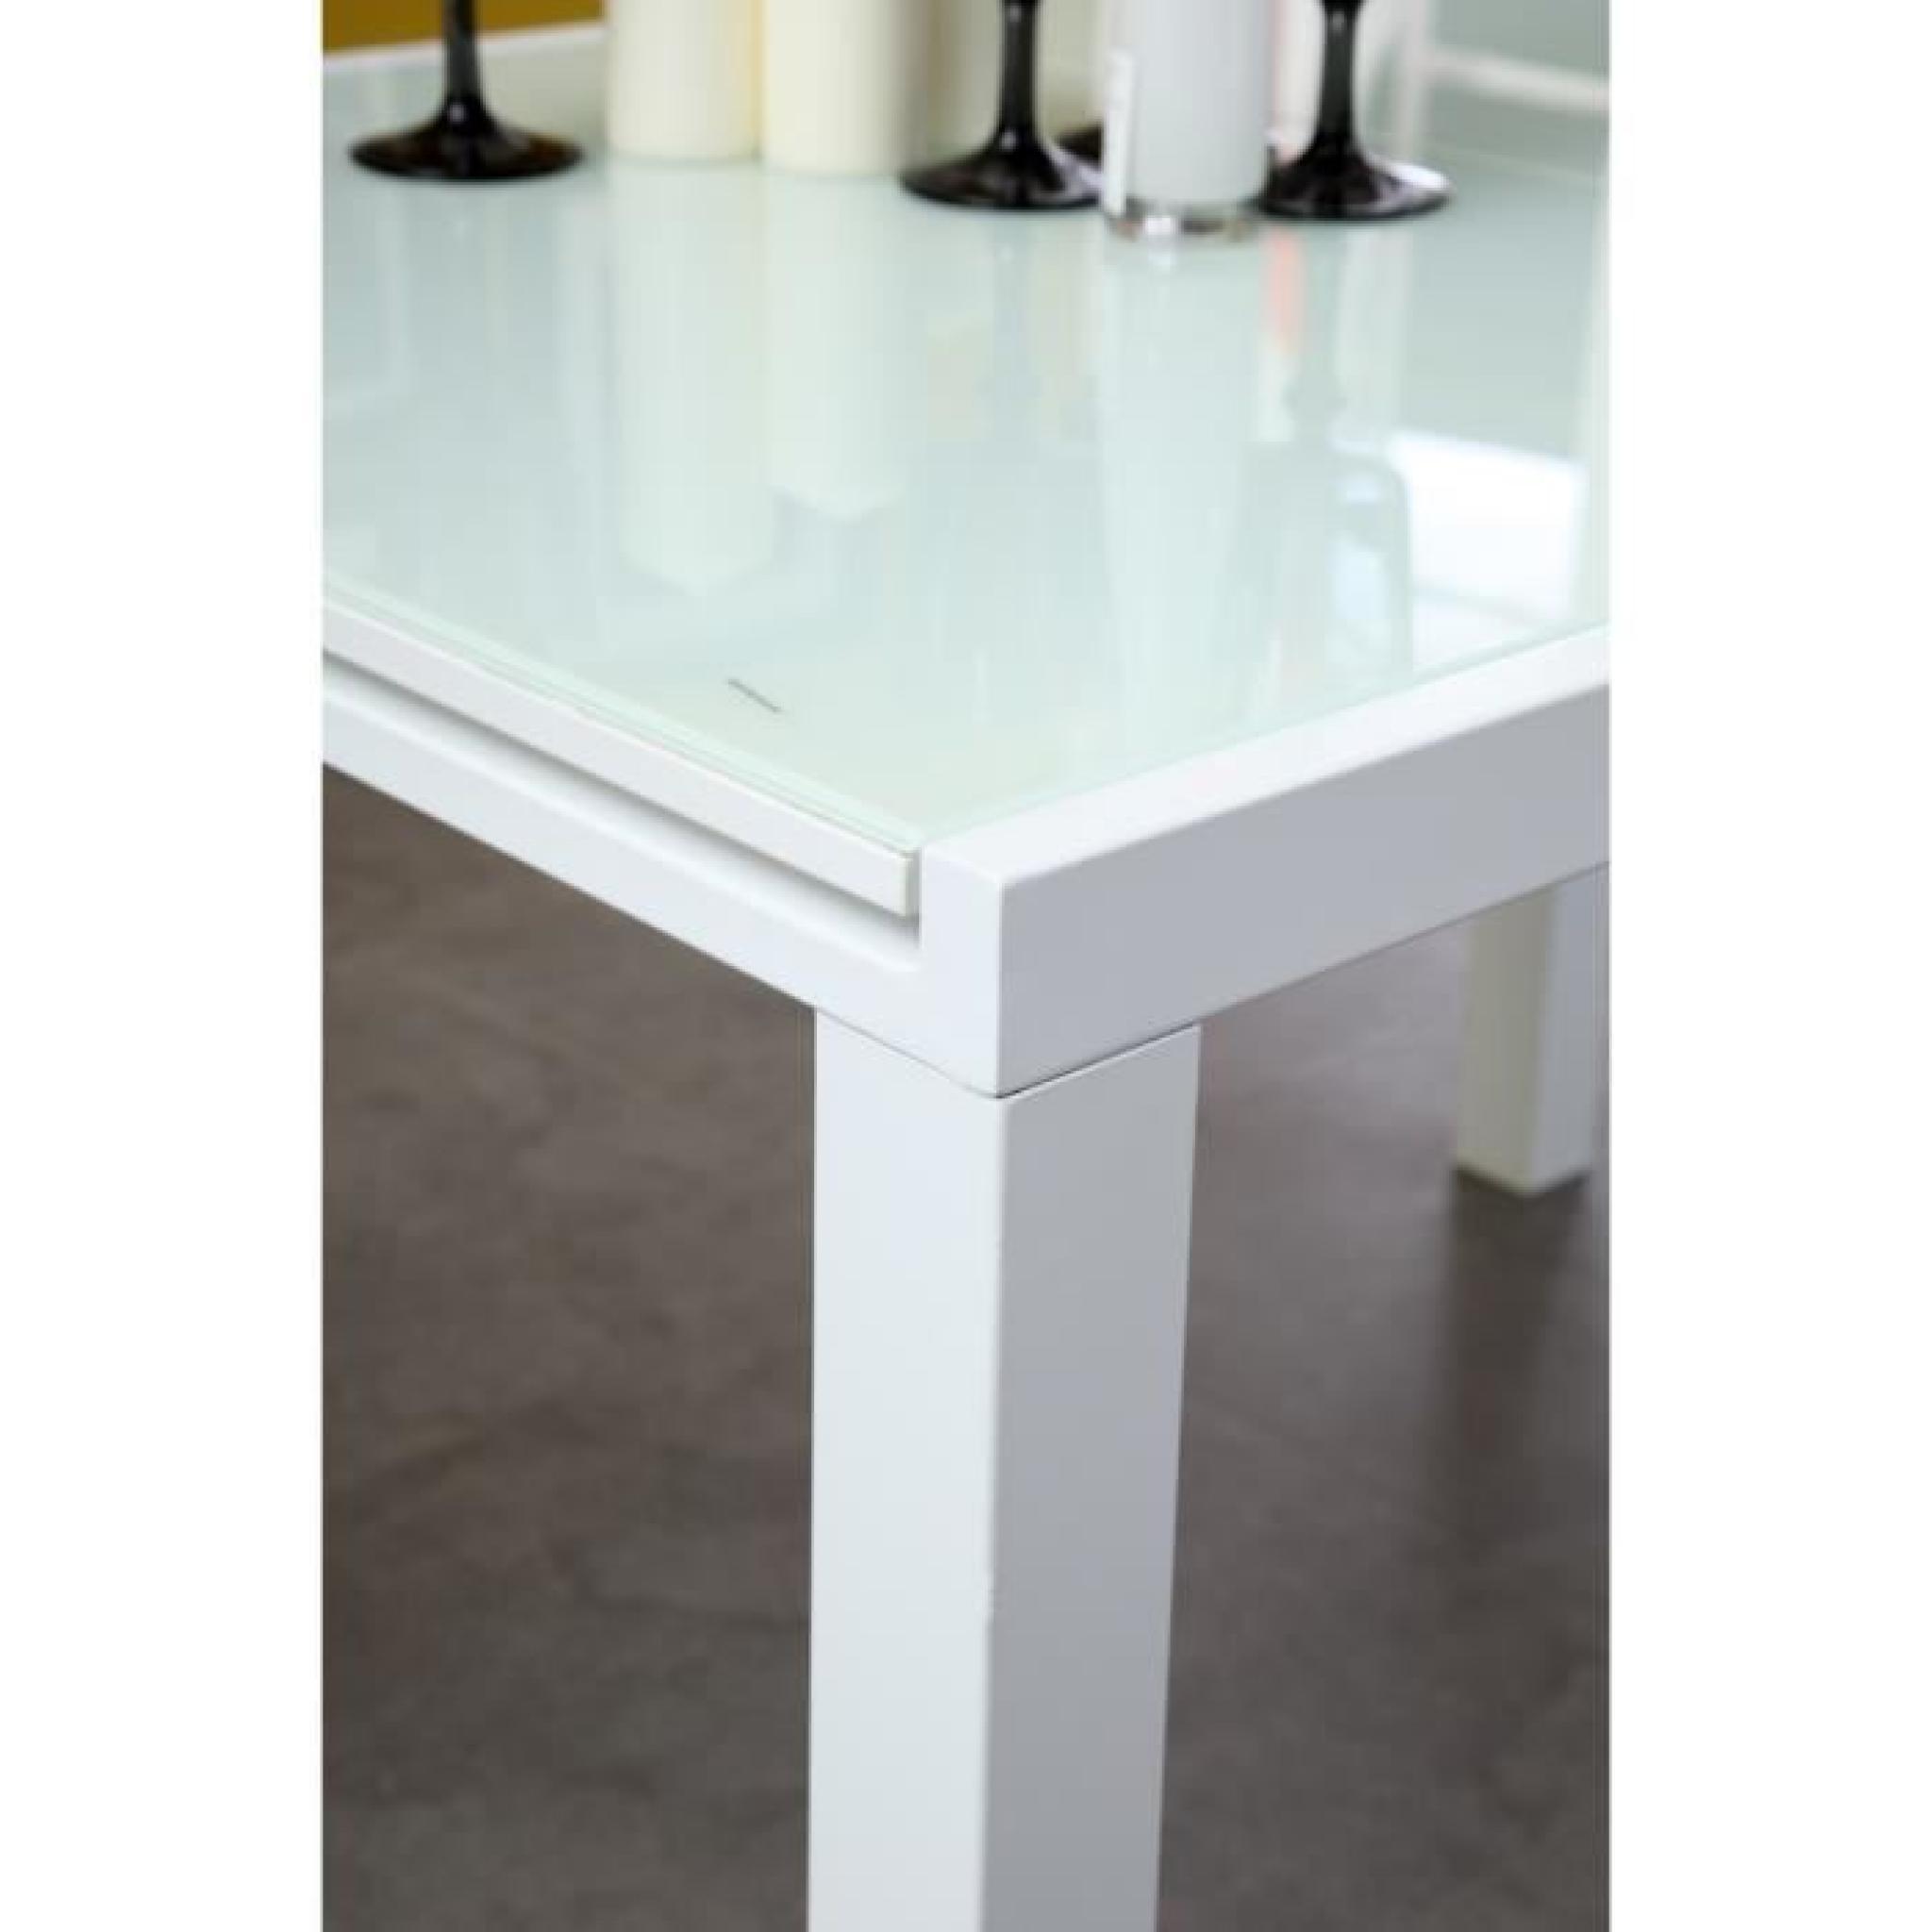 ROMA Table Extensible 120180cm Verre Blanc AchatVente